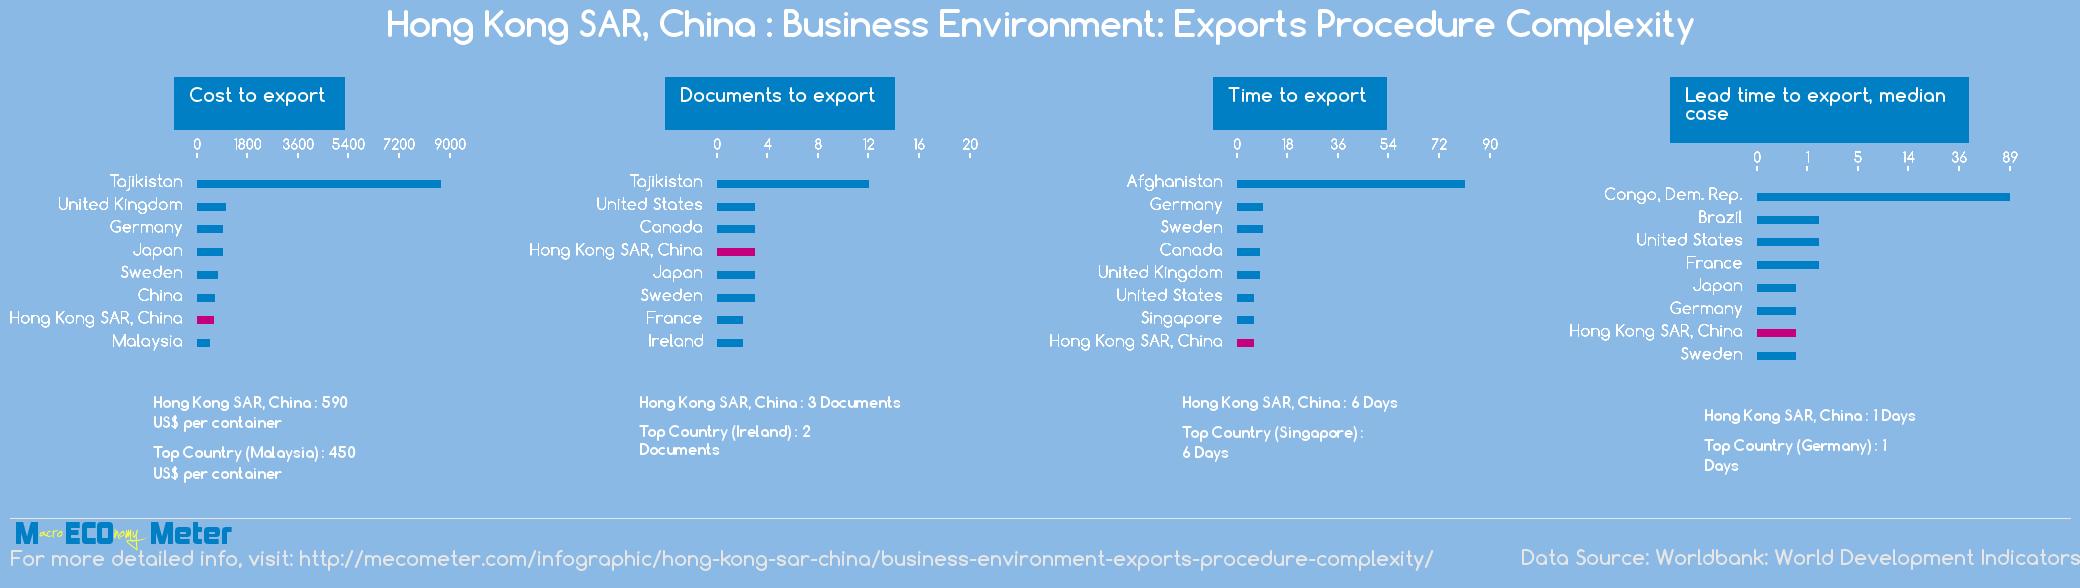 Hong Kong SAR, China : Business Environment: Exports Procedure Complexity